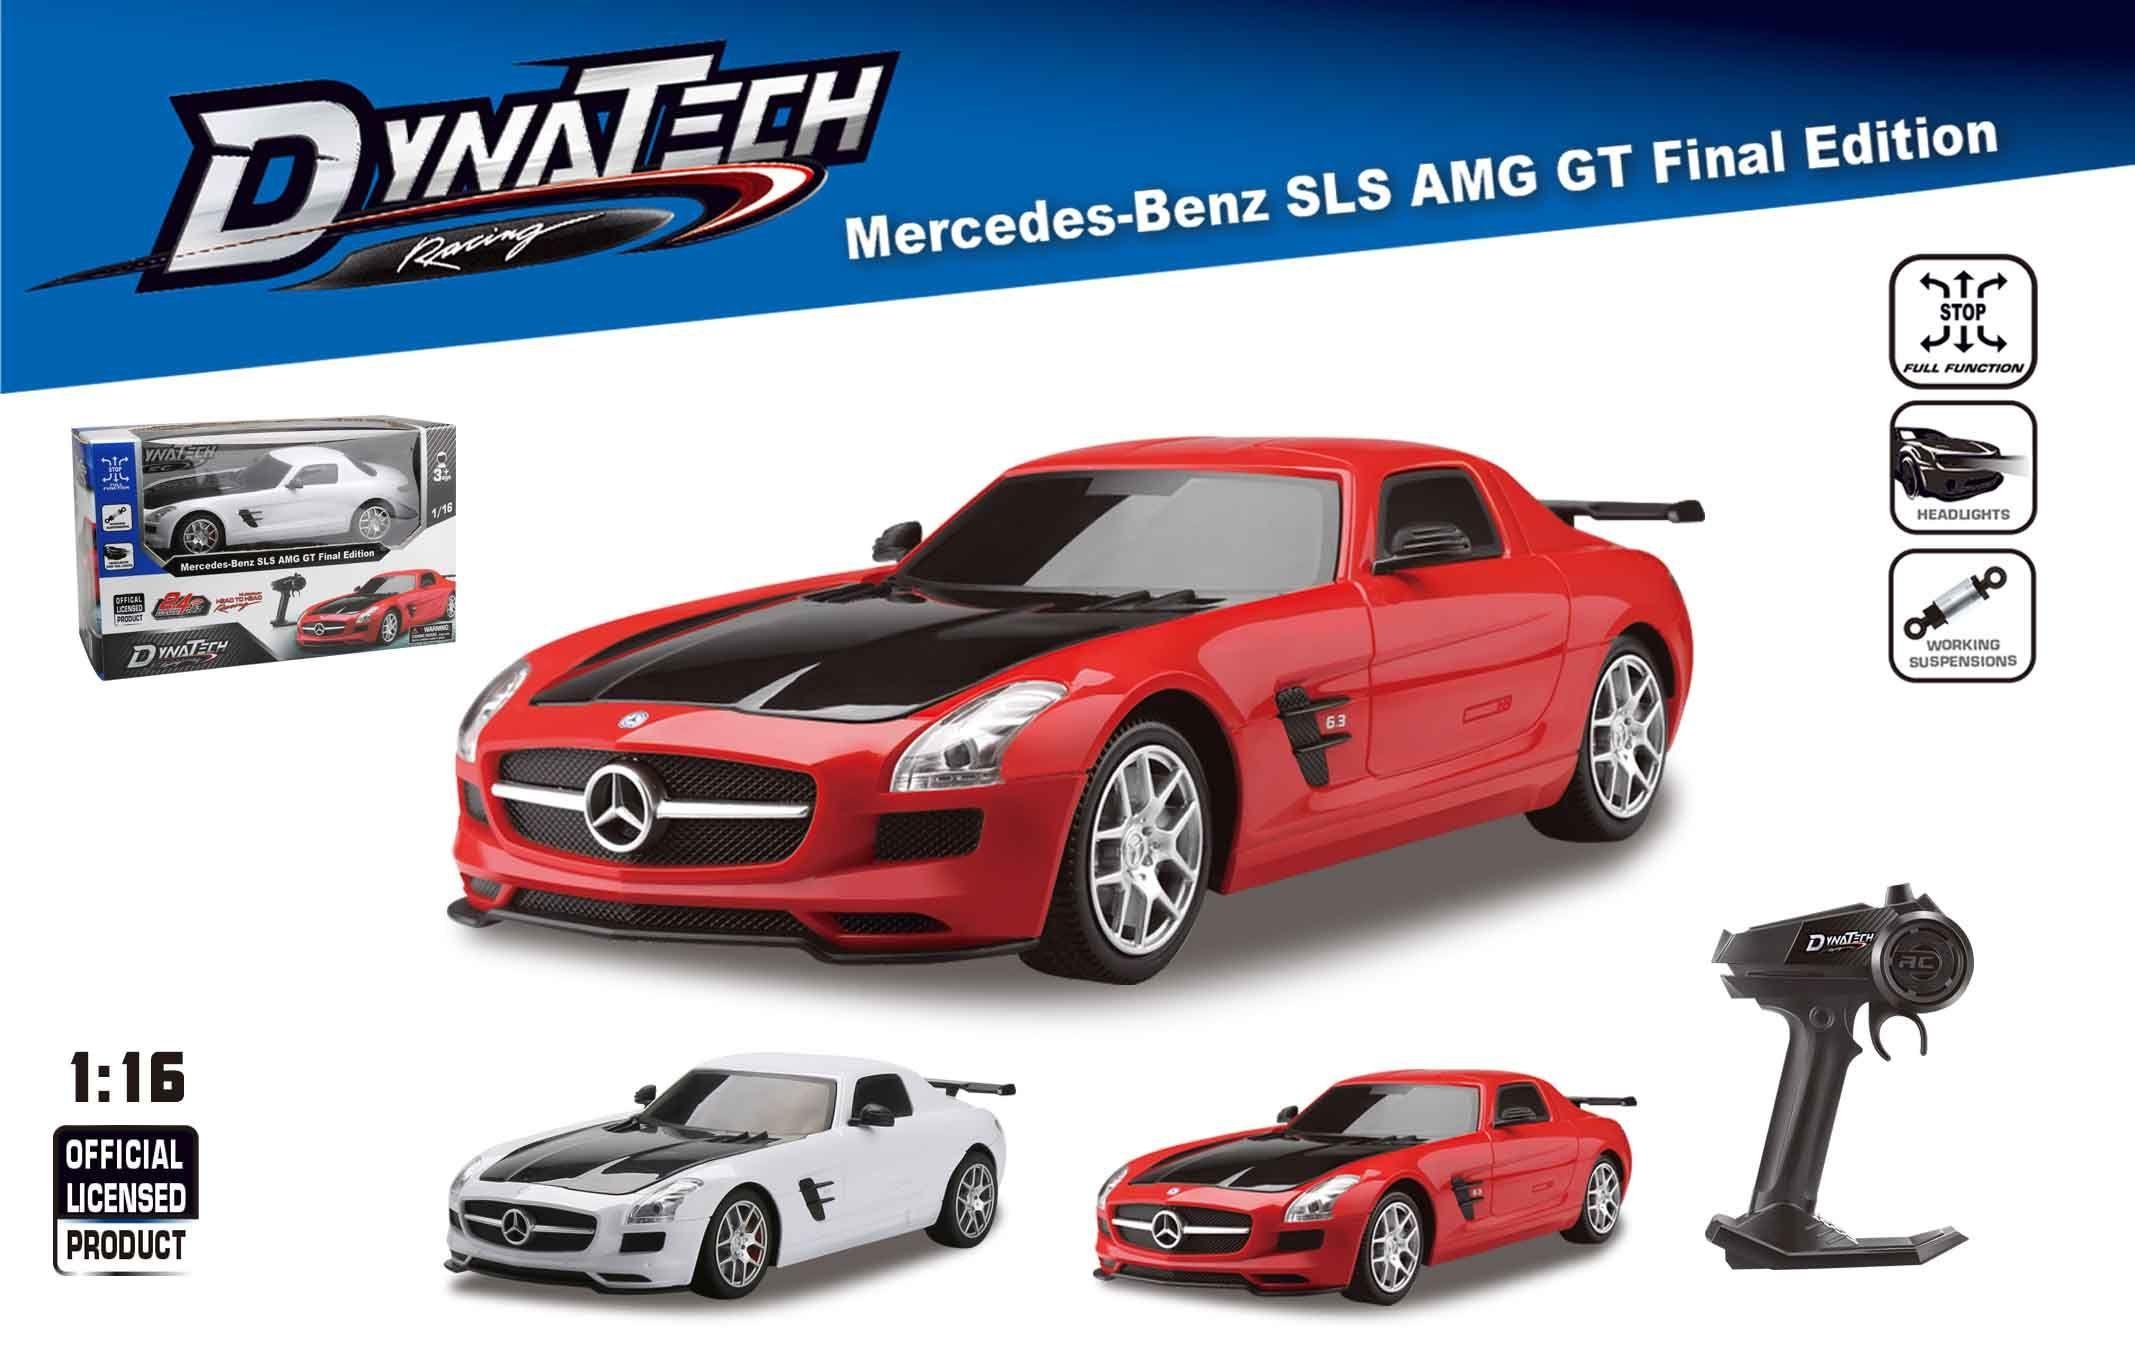 1 16 Full Function 2 4g R C Mercedes Benz Sls Amg Gt Final